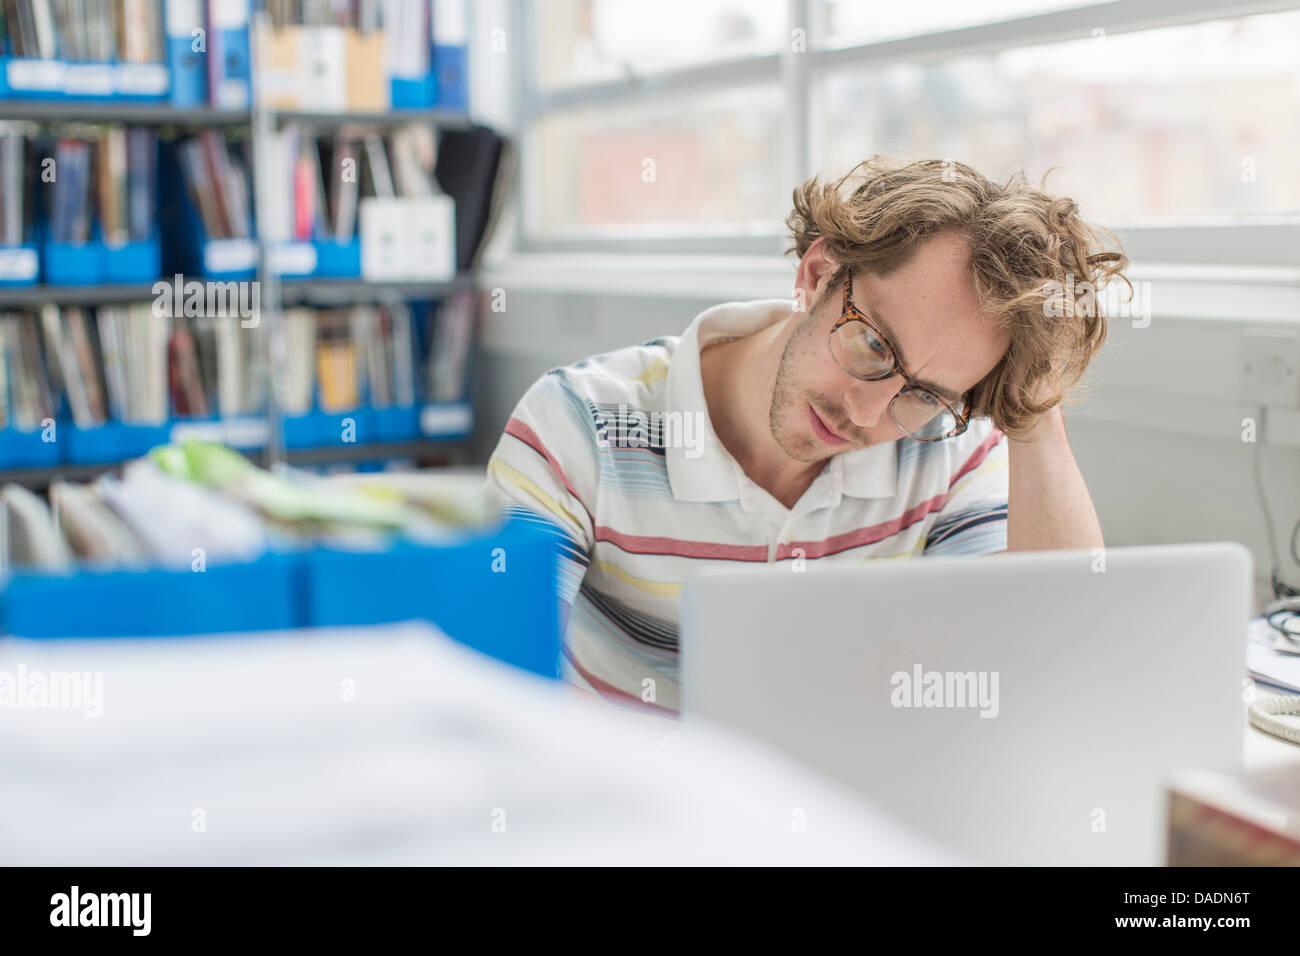 Junger Mann mit Kopf in Händen in Kreativbüro Stockbild